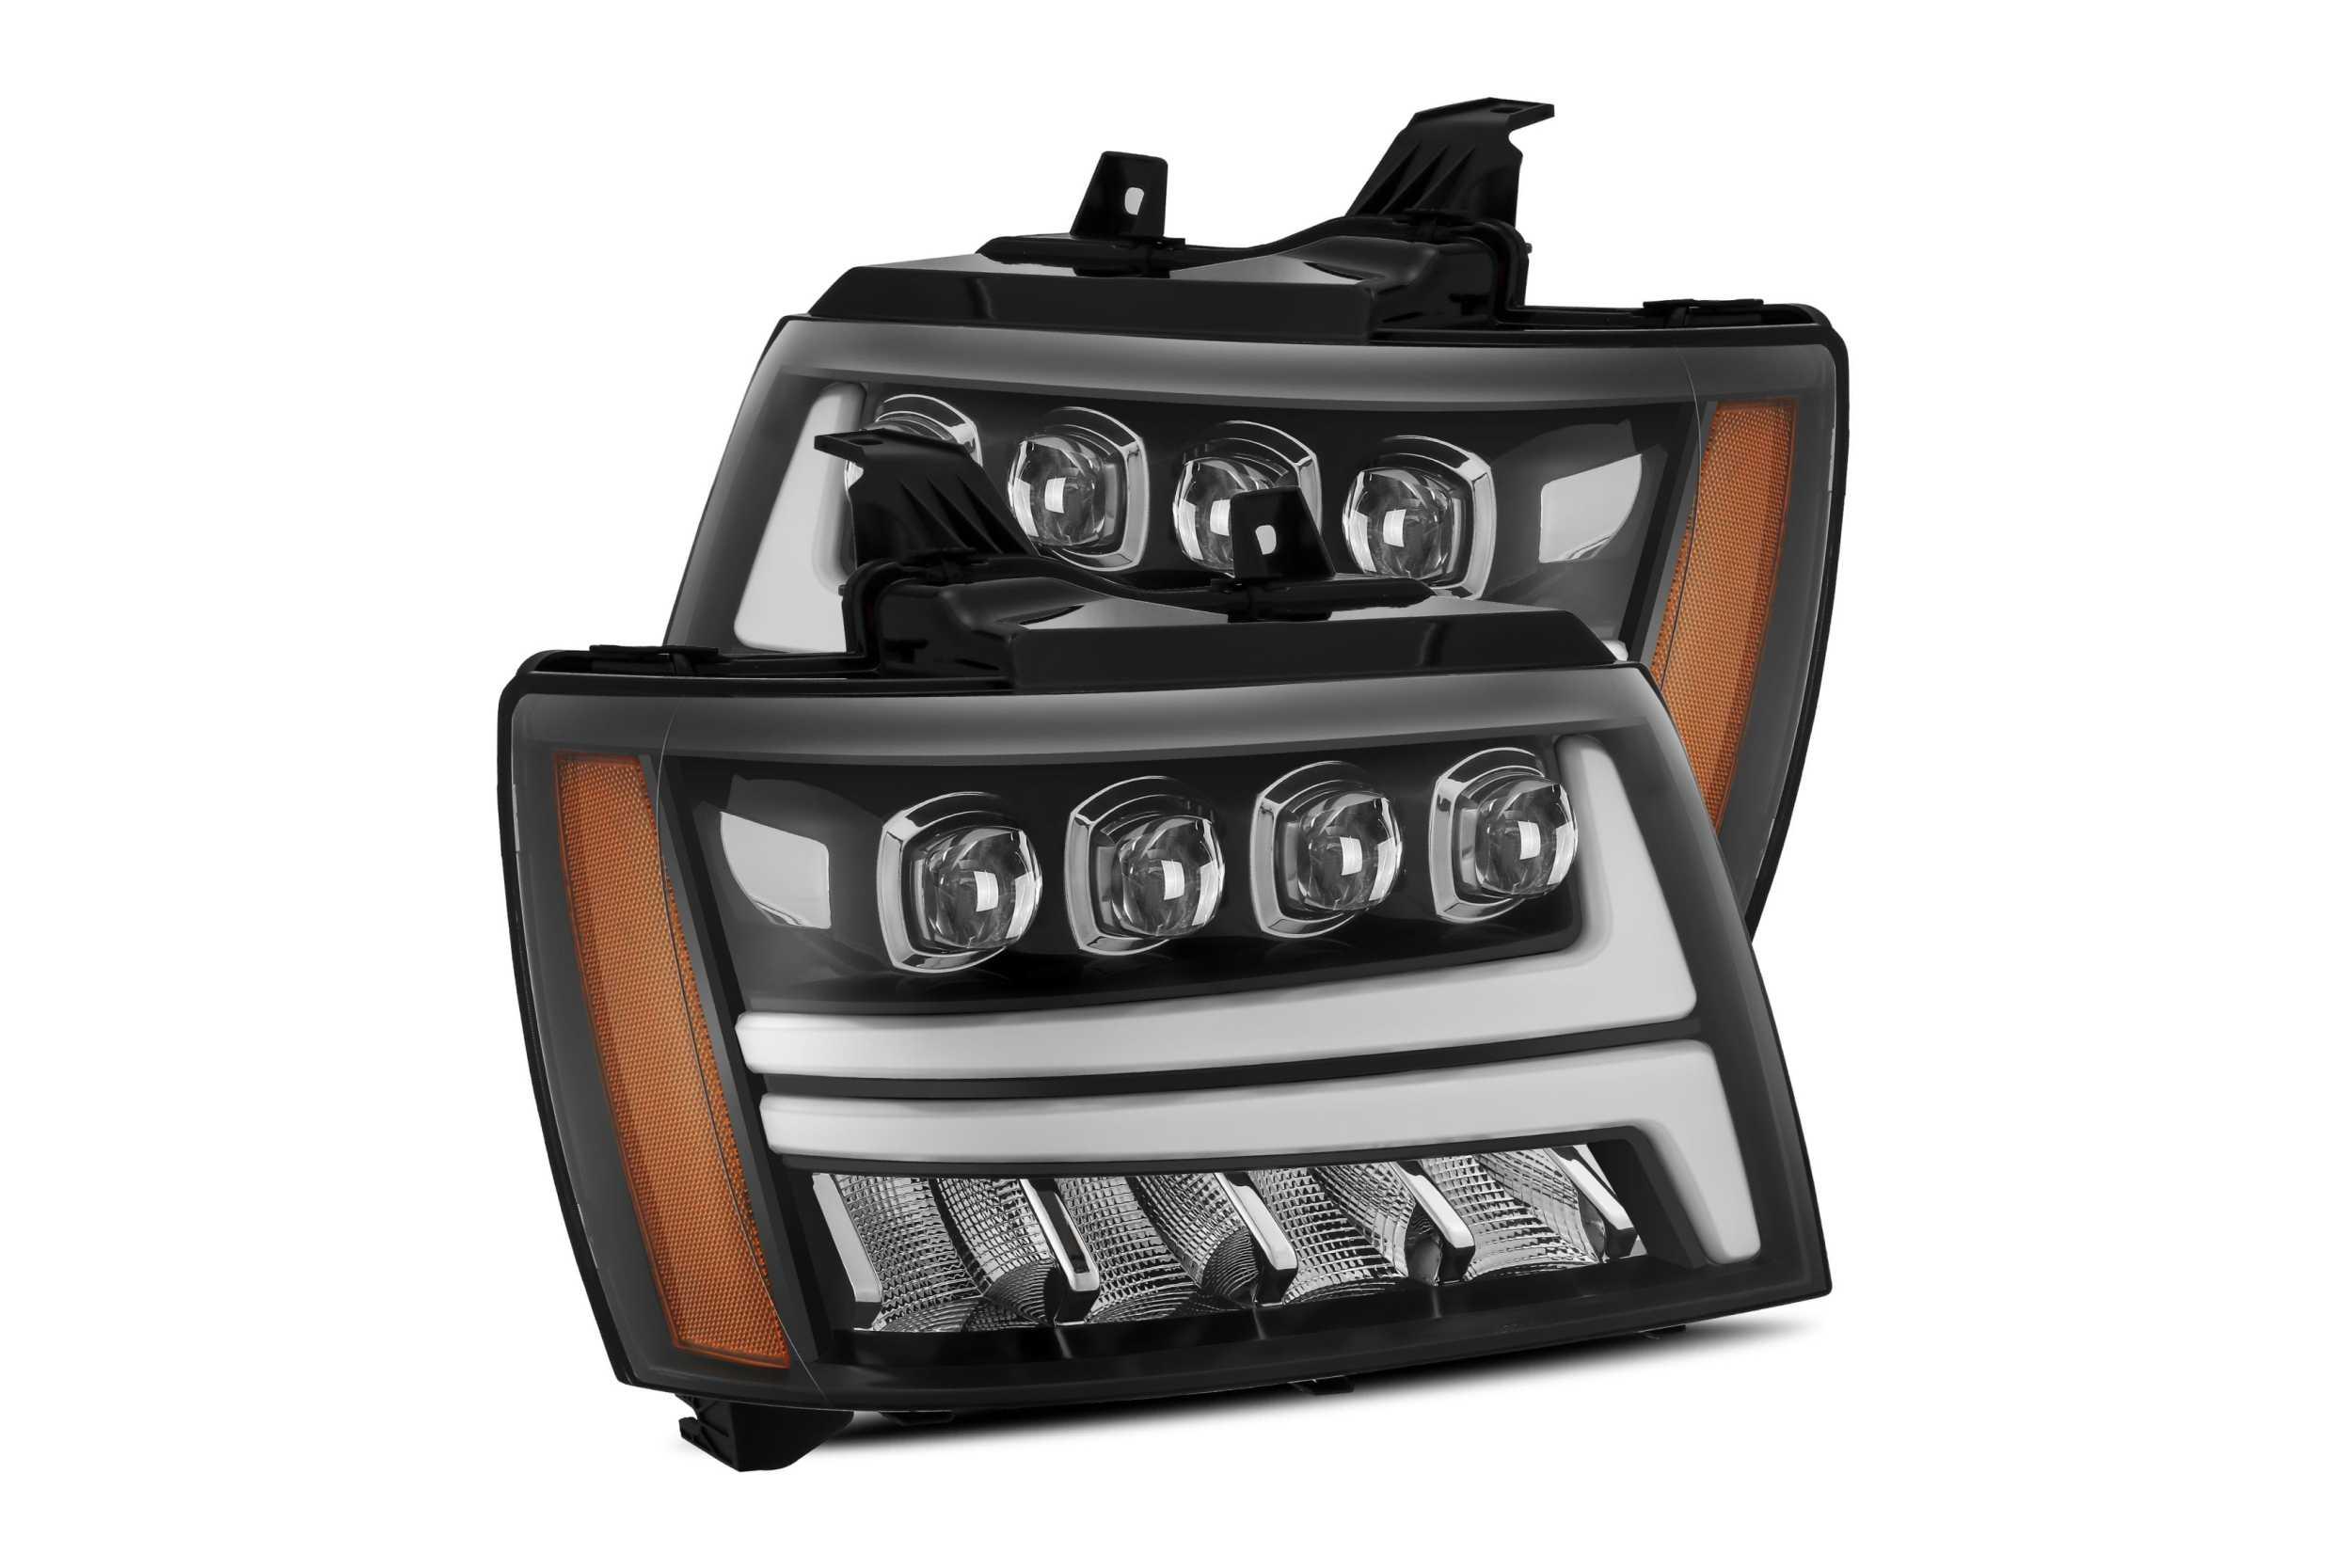 AlphaRex 880288 Projector Headlights For 07-14 Tahoe